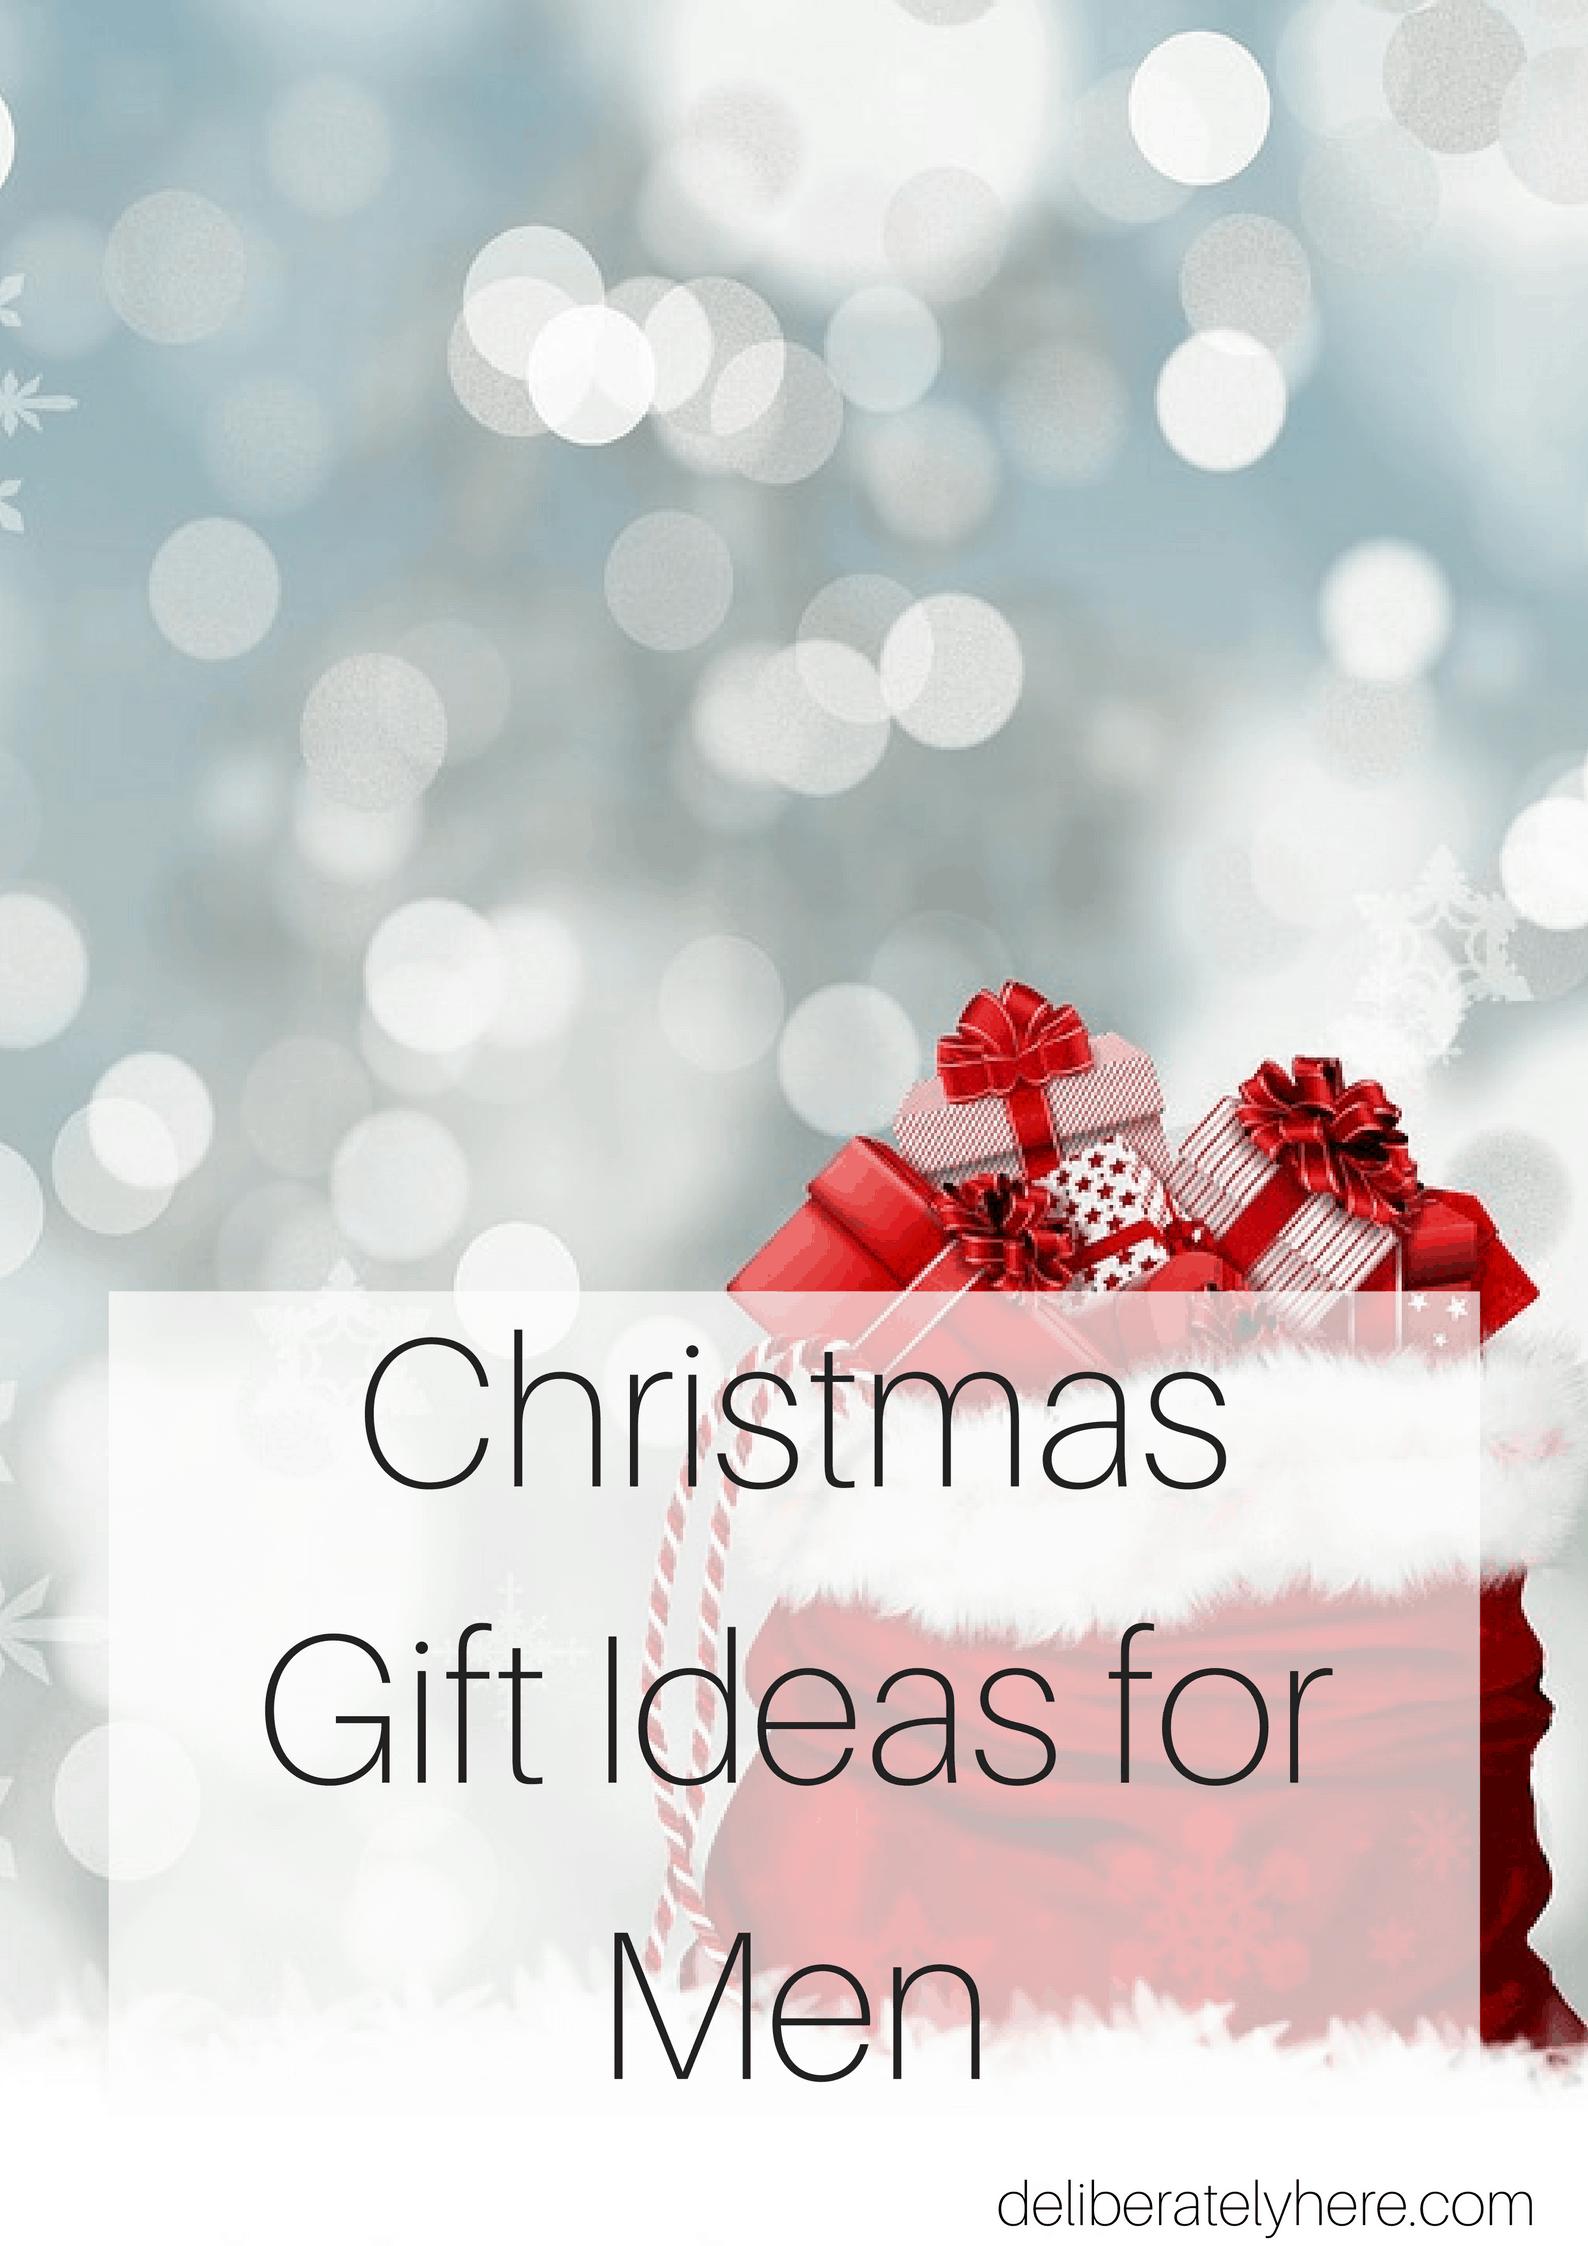 Christmas gift ideas for men, Christmas presents, Christmas shopping